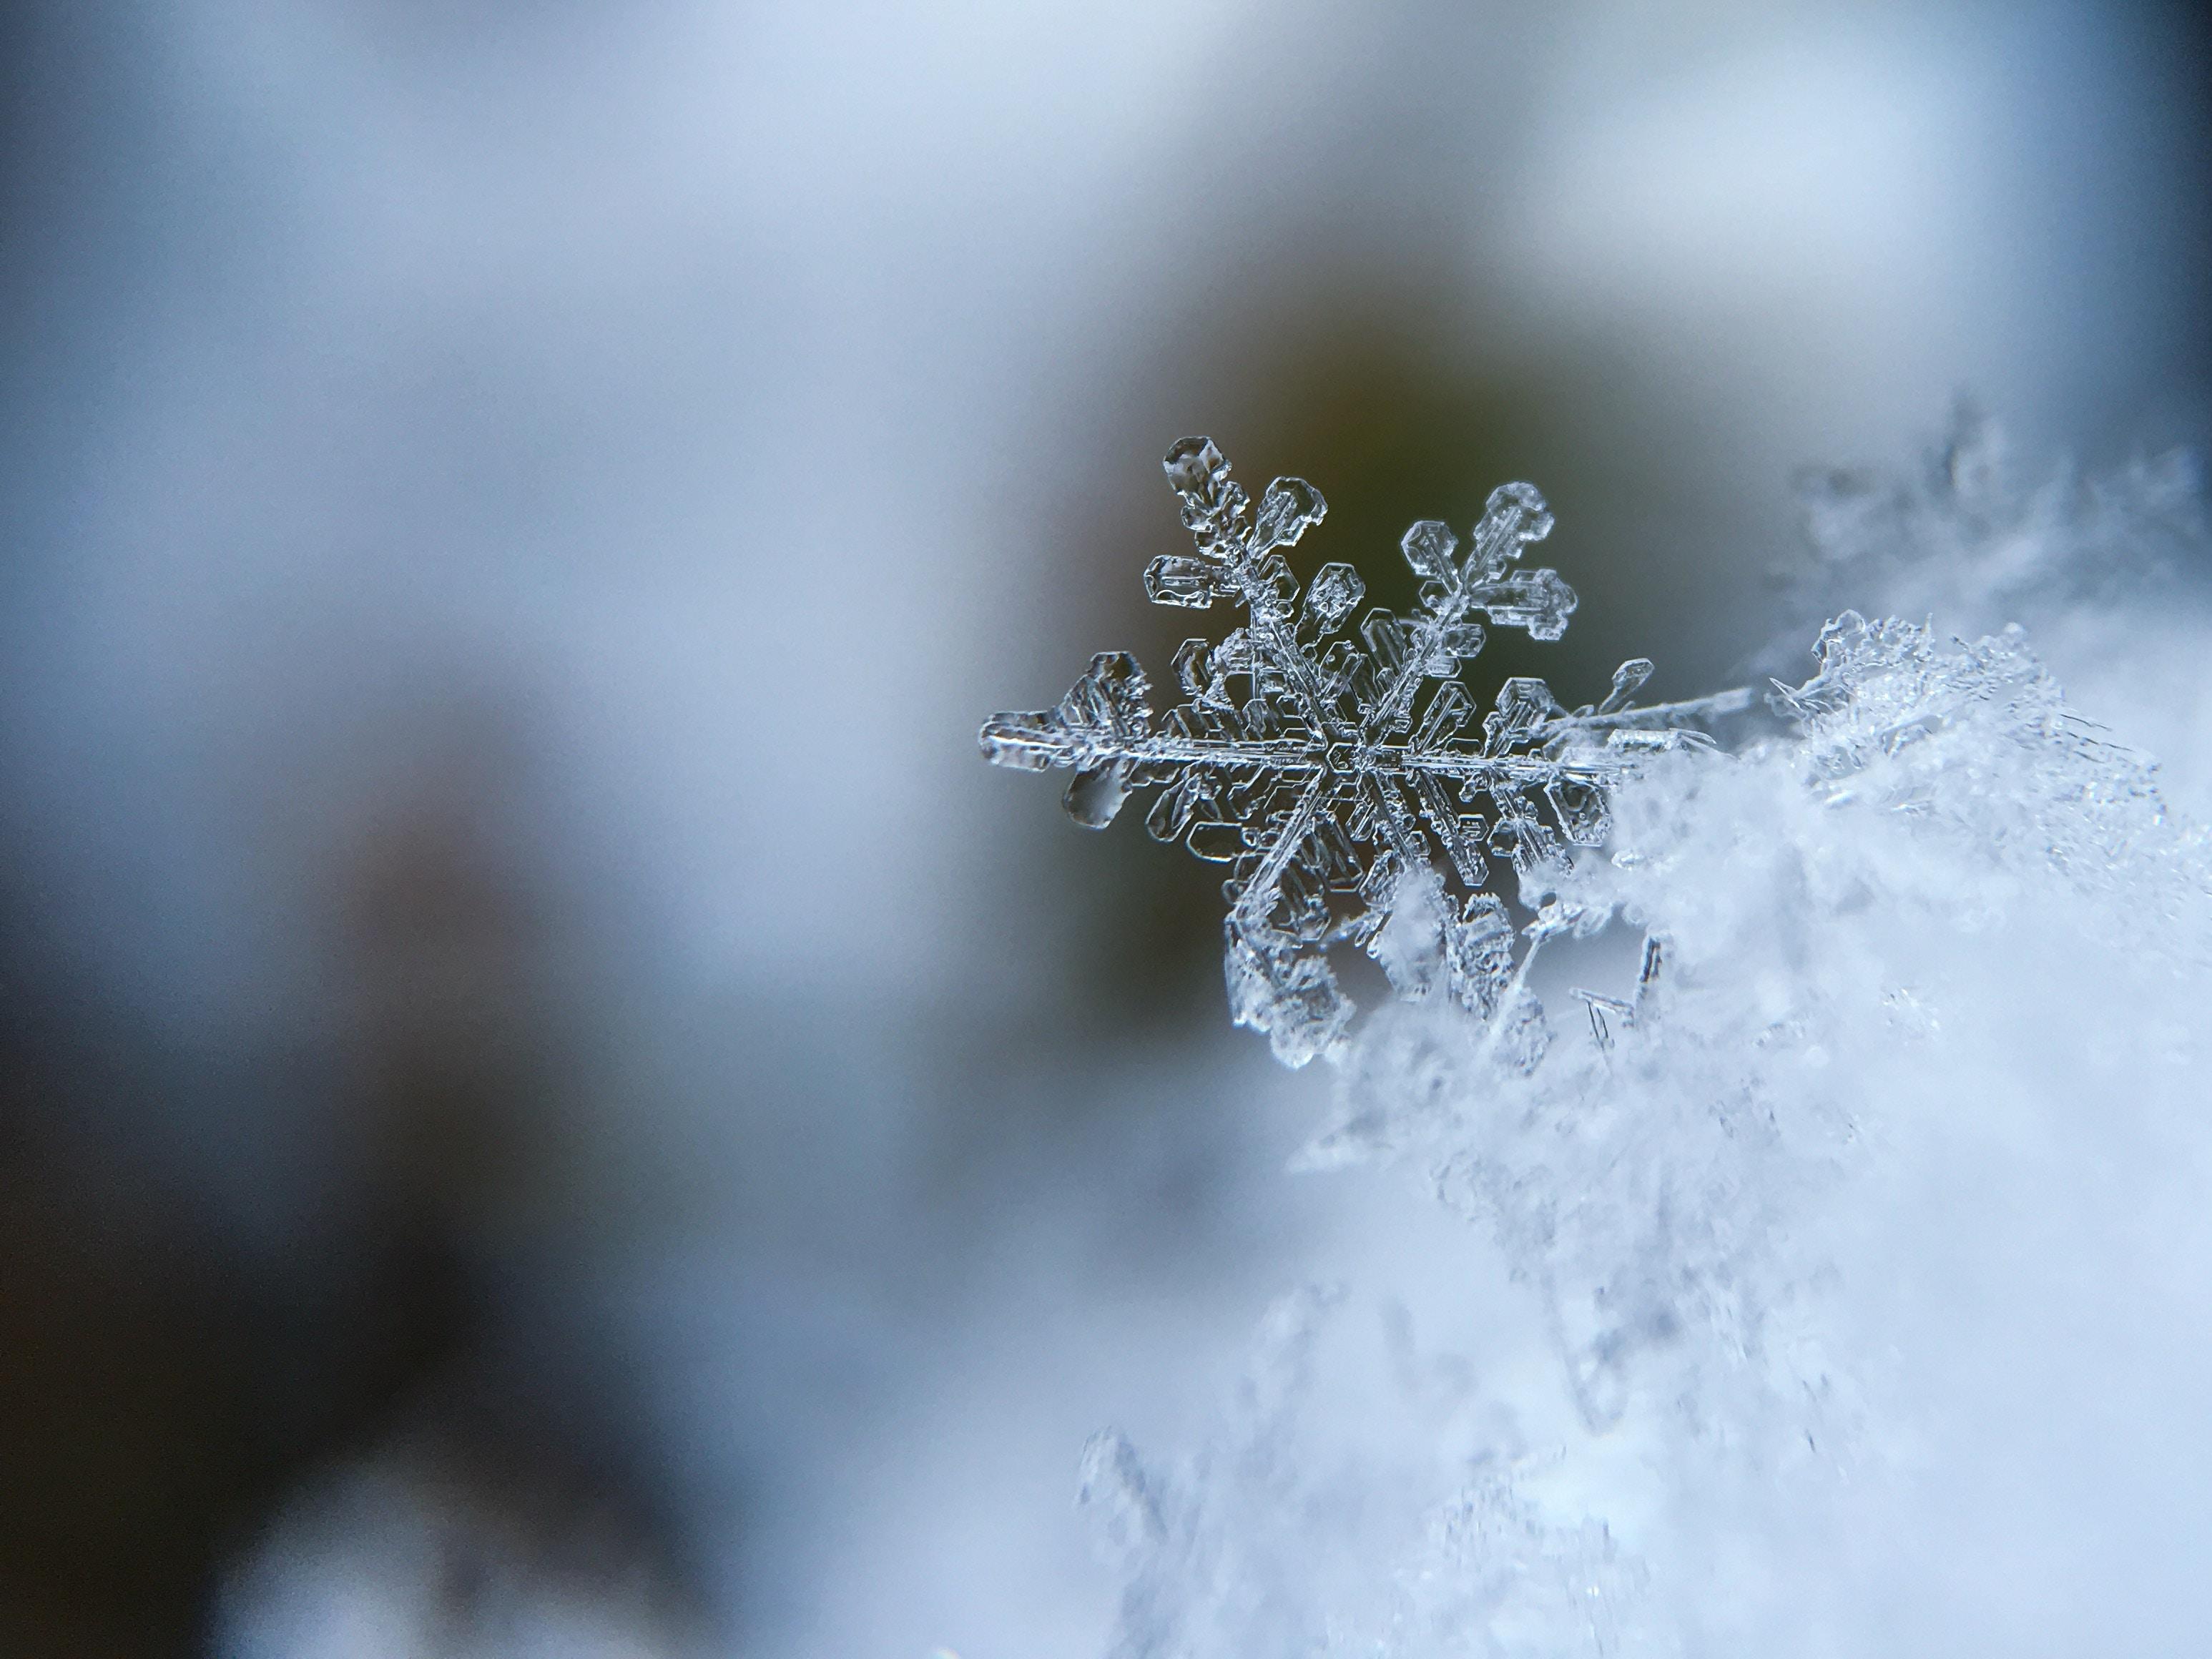 freeze, crystalline jewel